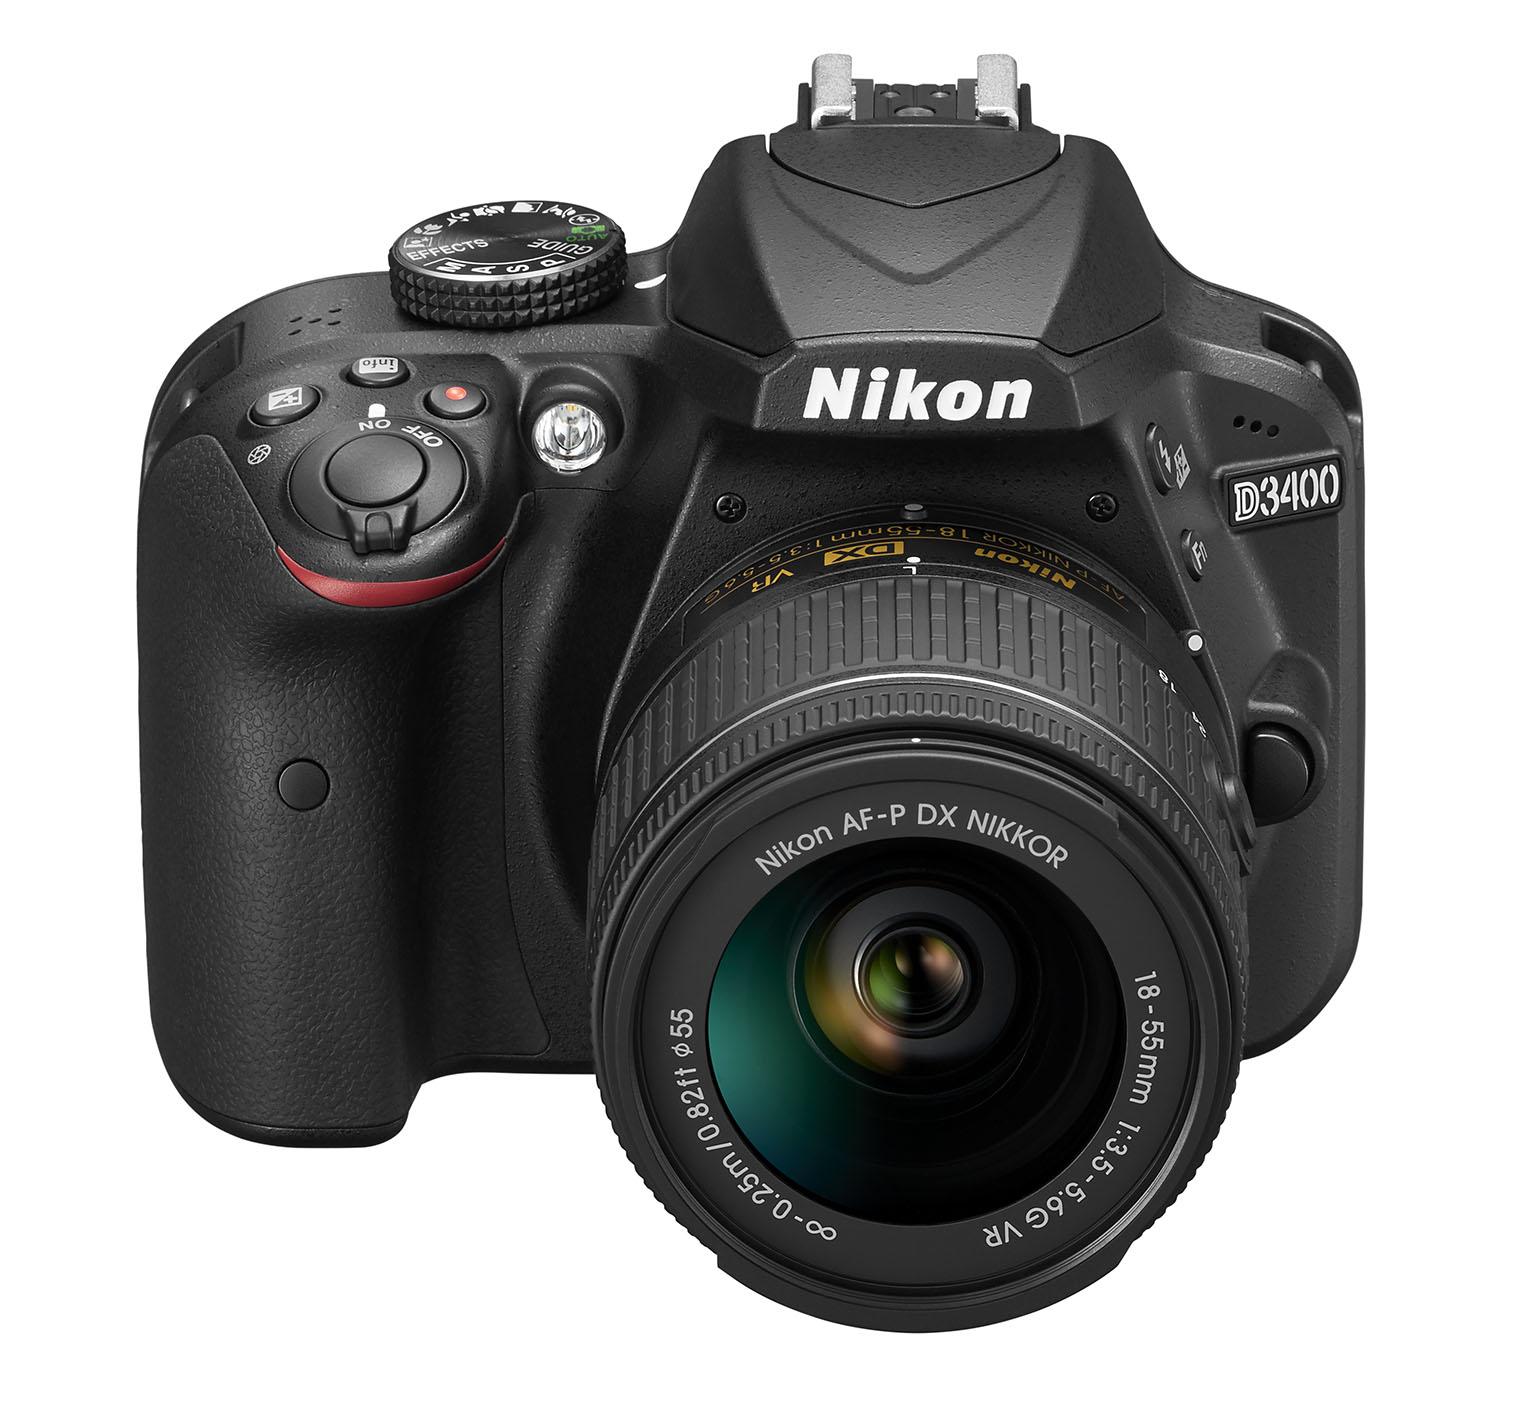 Тест Nikon D3400: зеркальная камера начального уровня